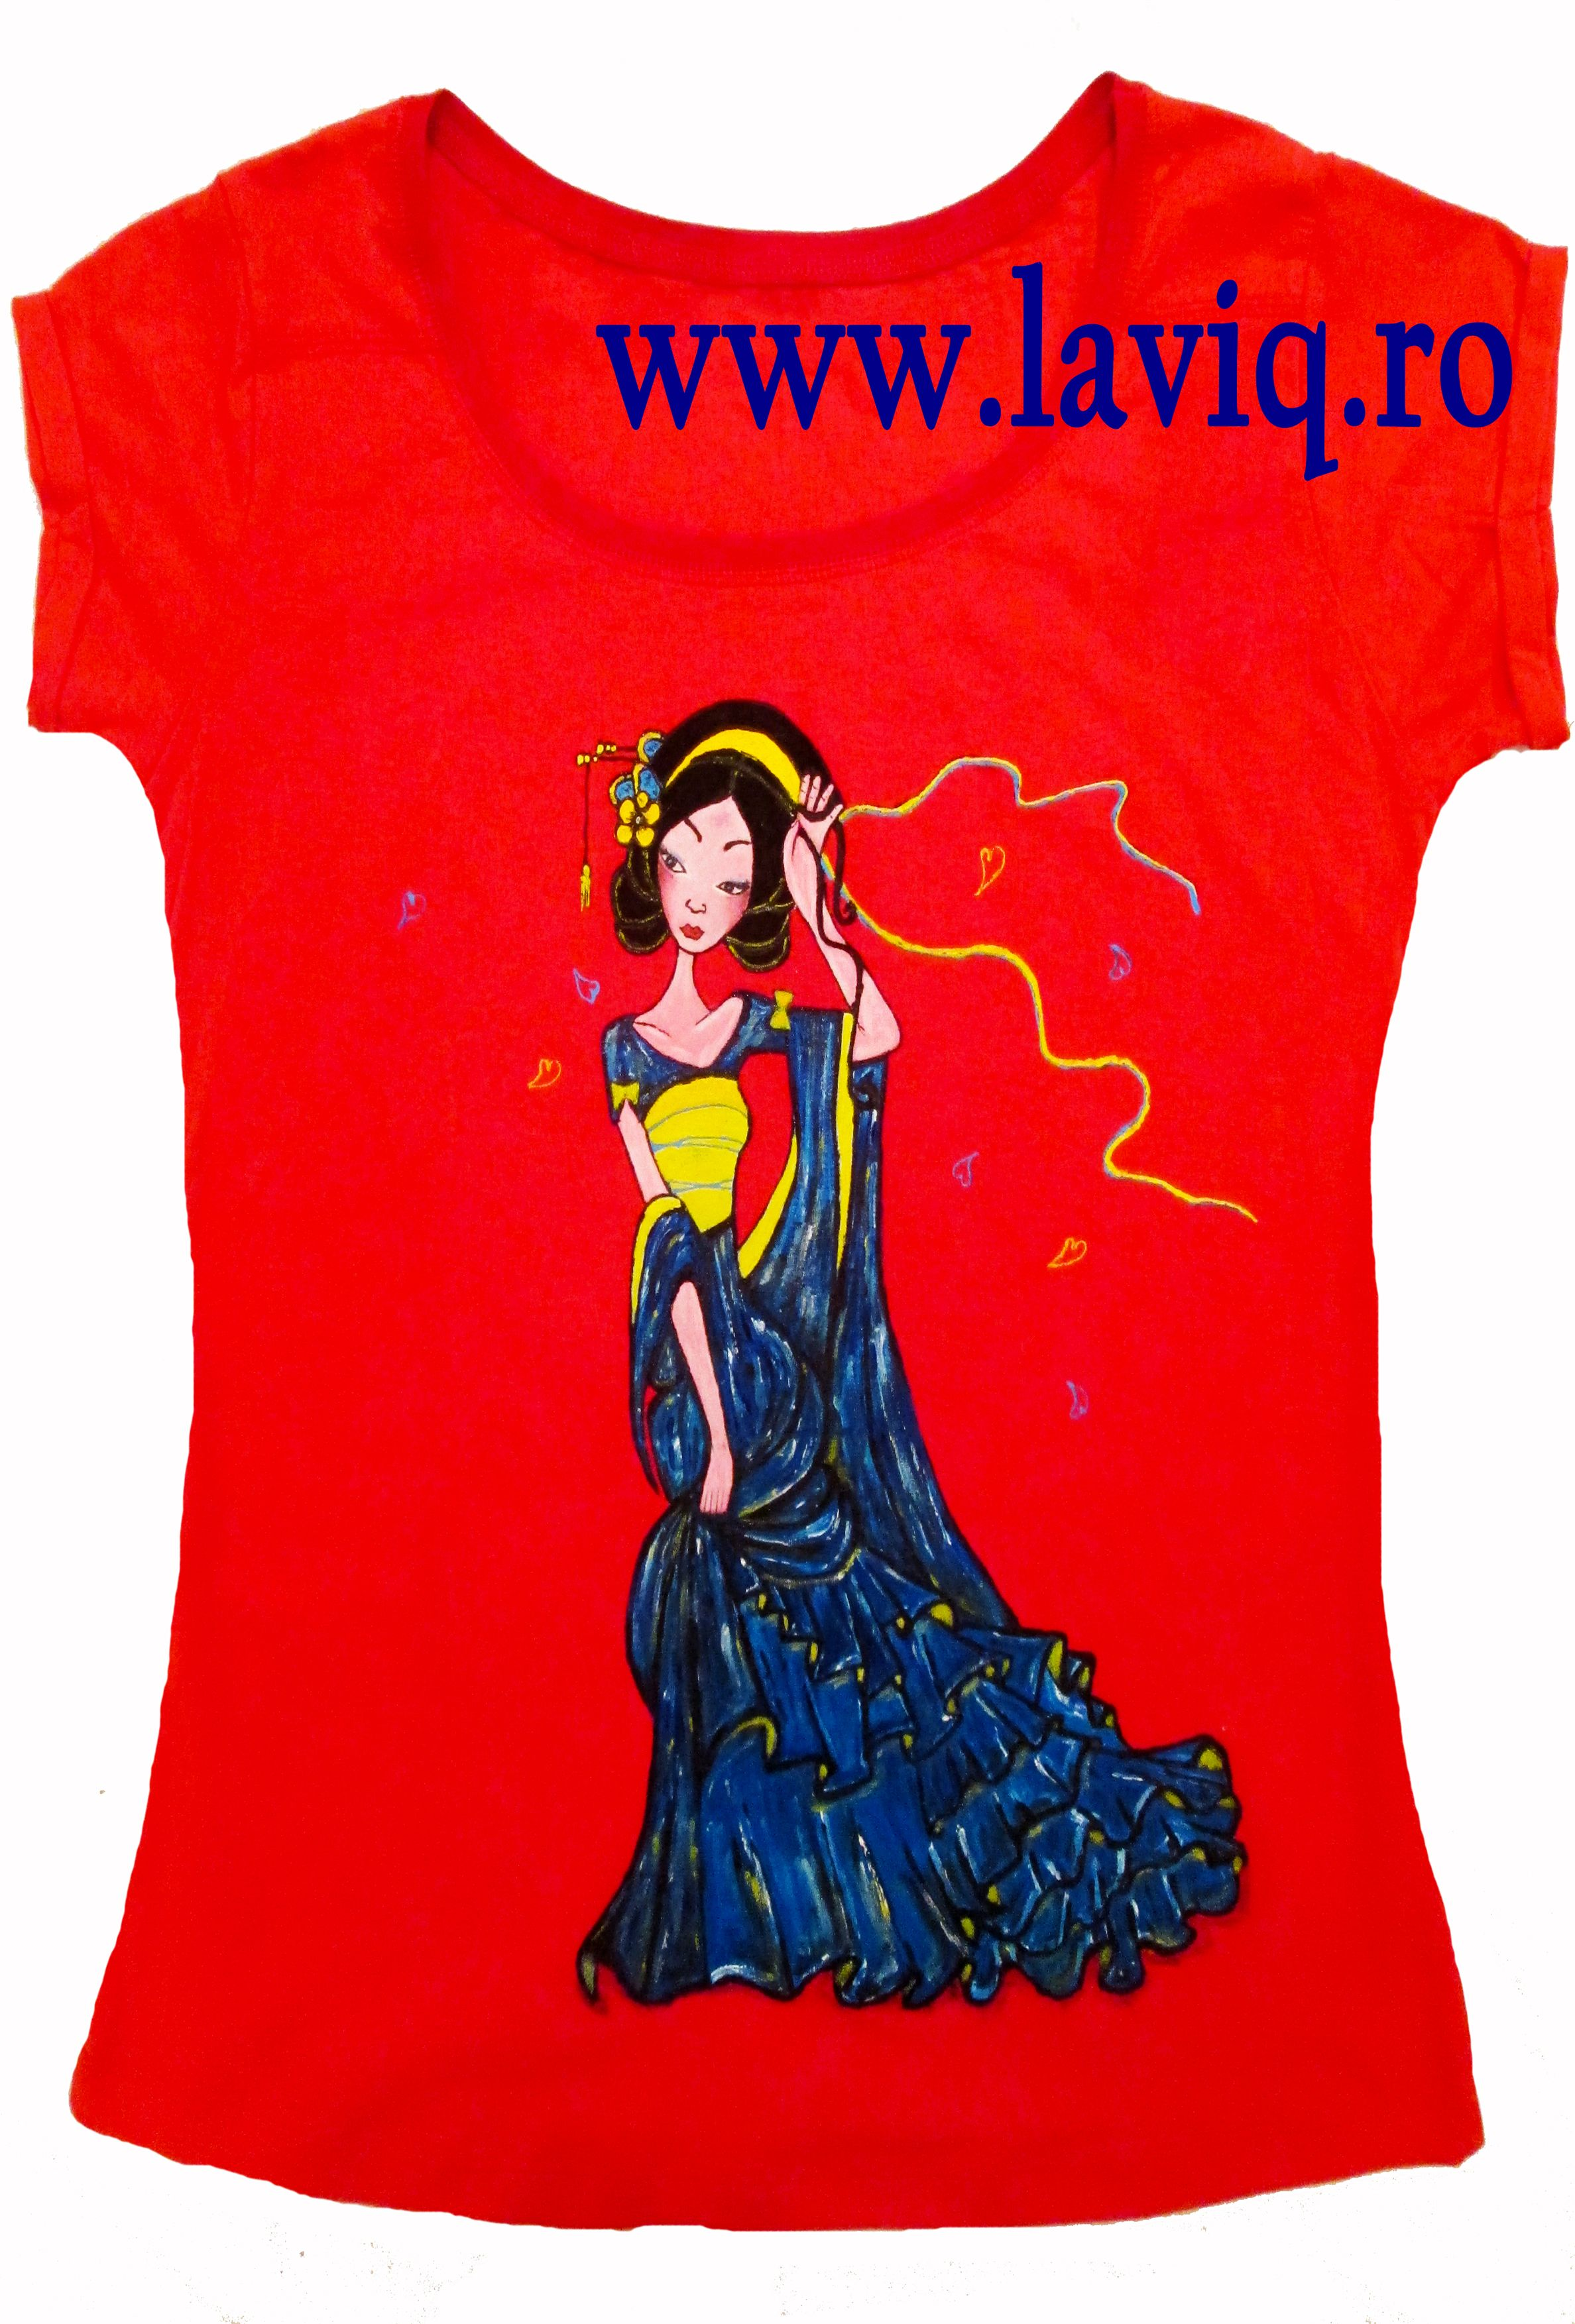 Tricou Pictat Japanese 5 Www Laviq Ro Www Facebook Com Pages Laviq 206808016028814 Women S Top Fashion Women